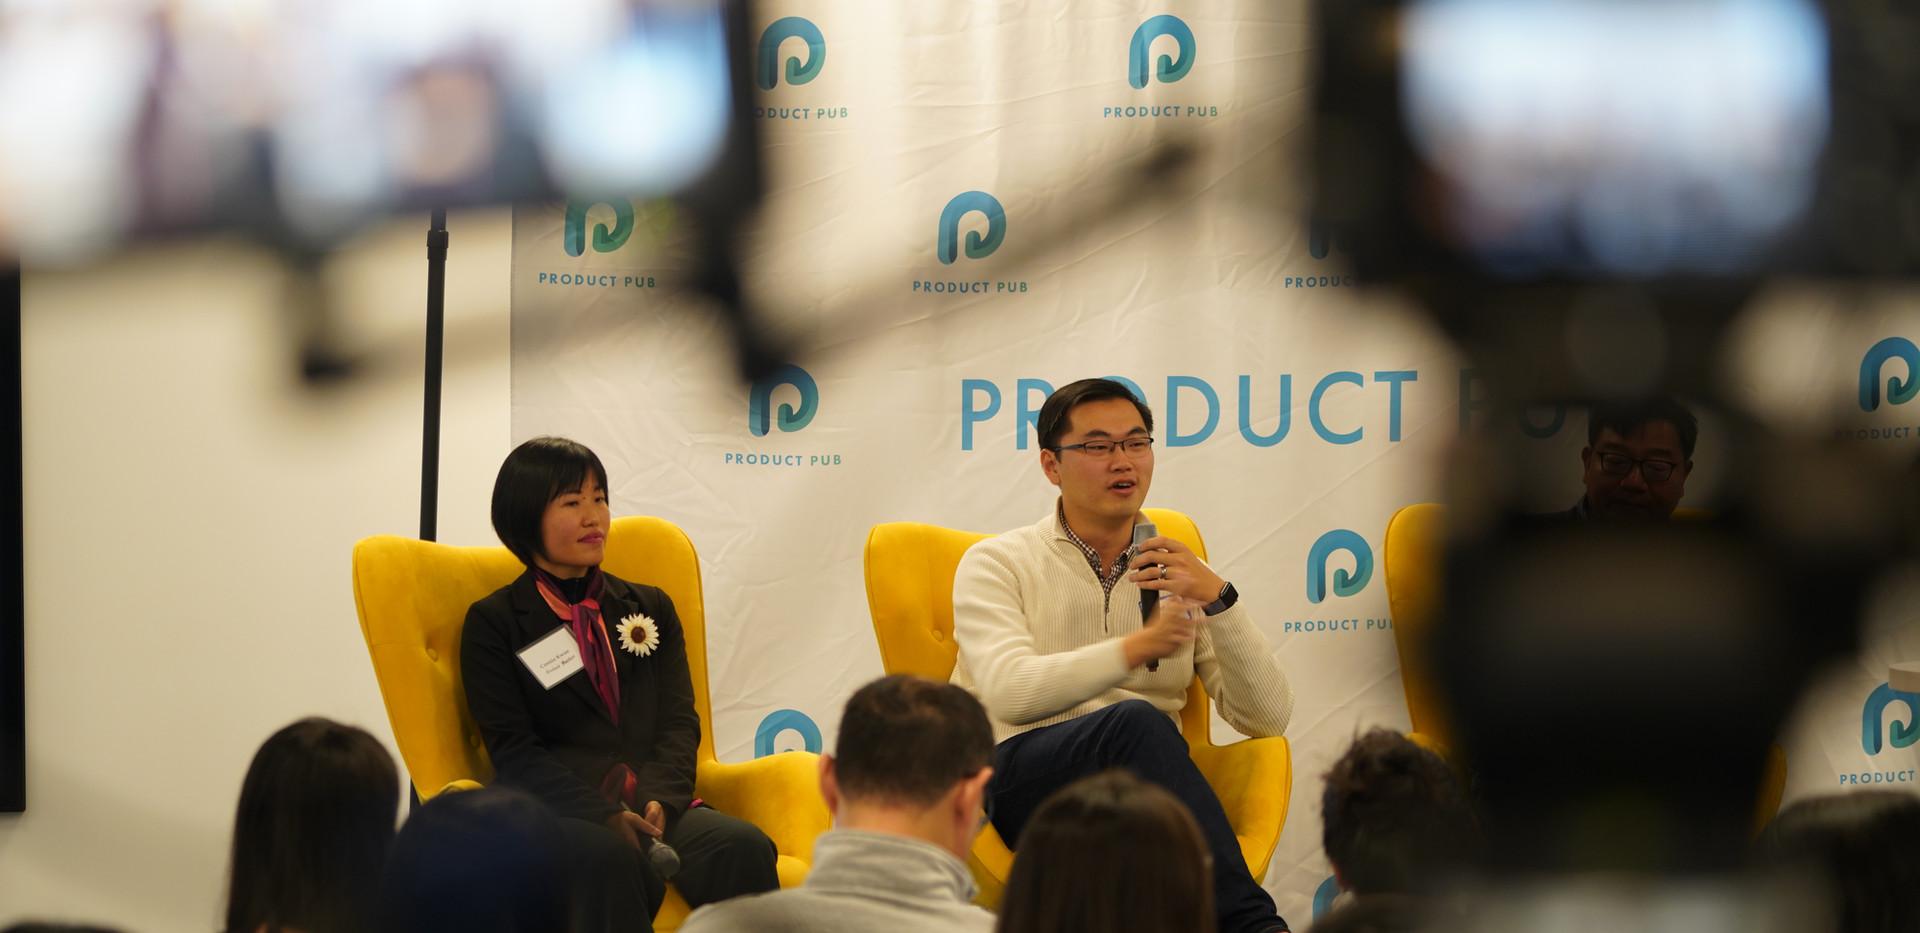 Product-Pub-Summit-2018-10